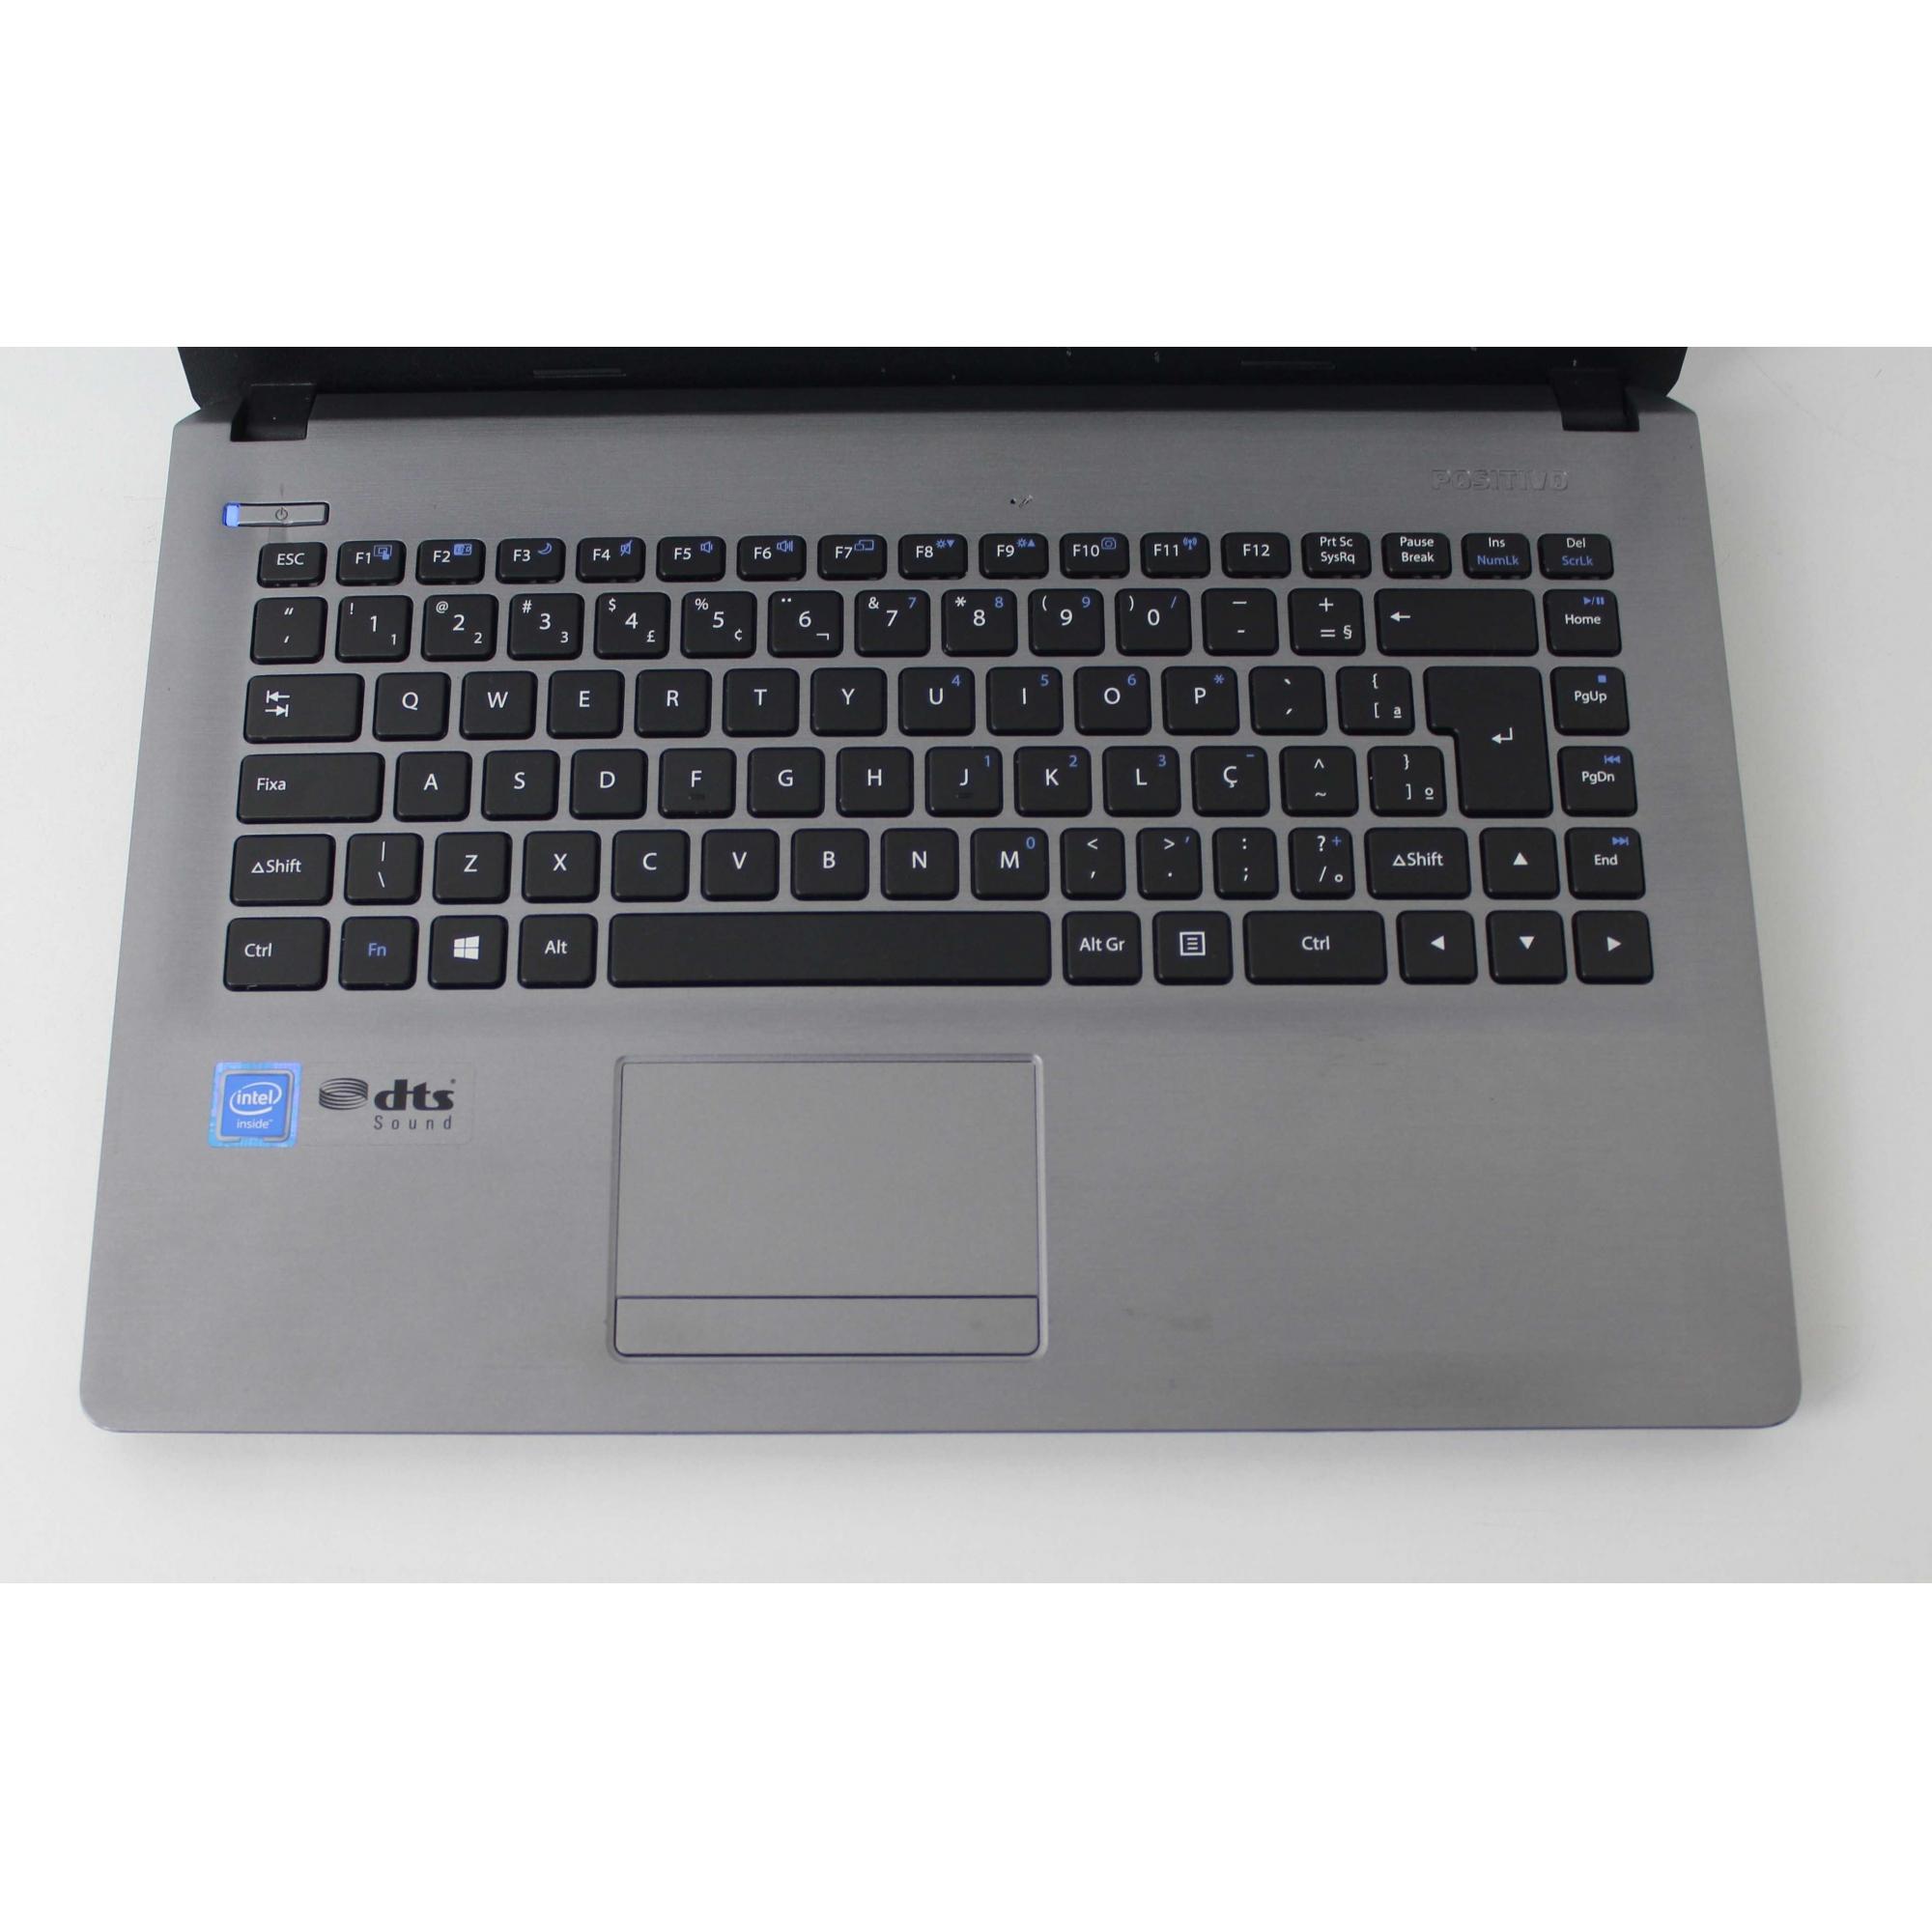 "Notebook Positivo Stilo XR 3500 14"" Intel Celeron 1.58GHz 4GB HD- 500GB"